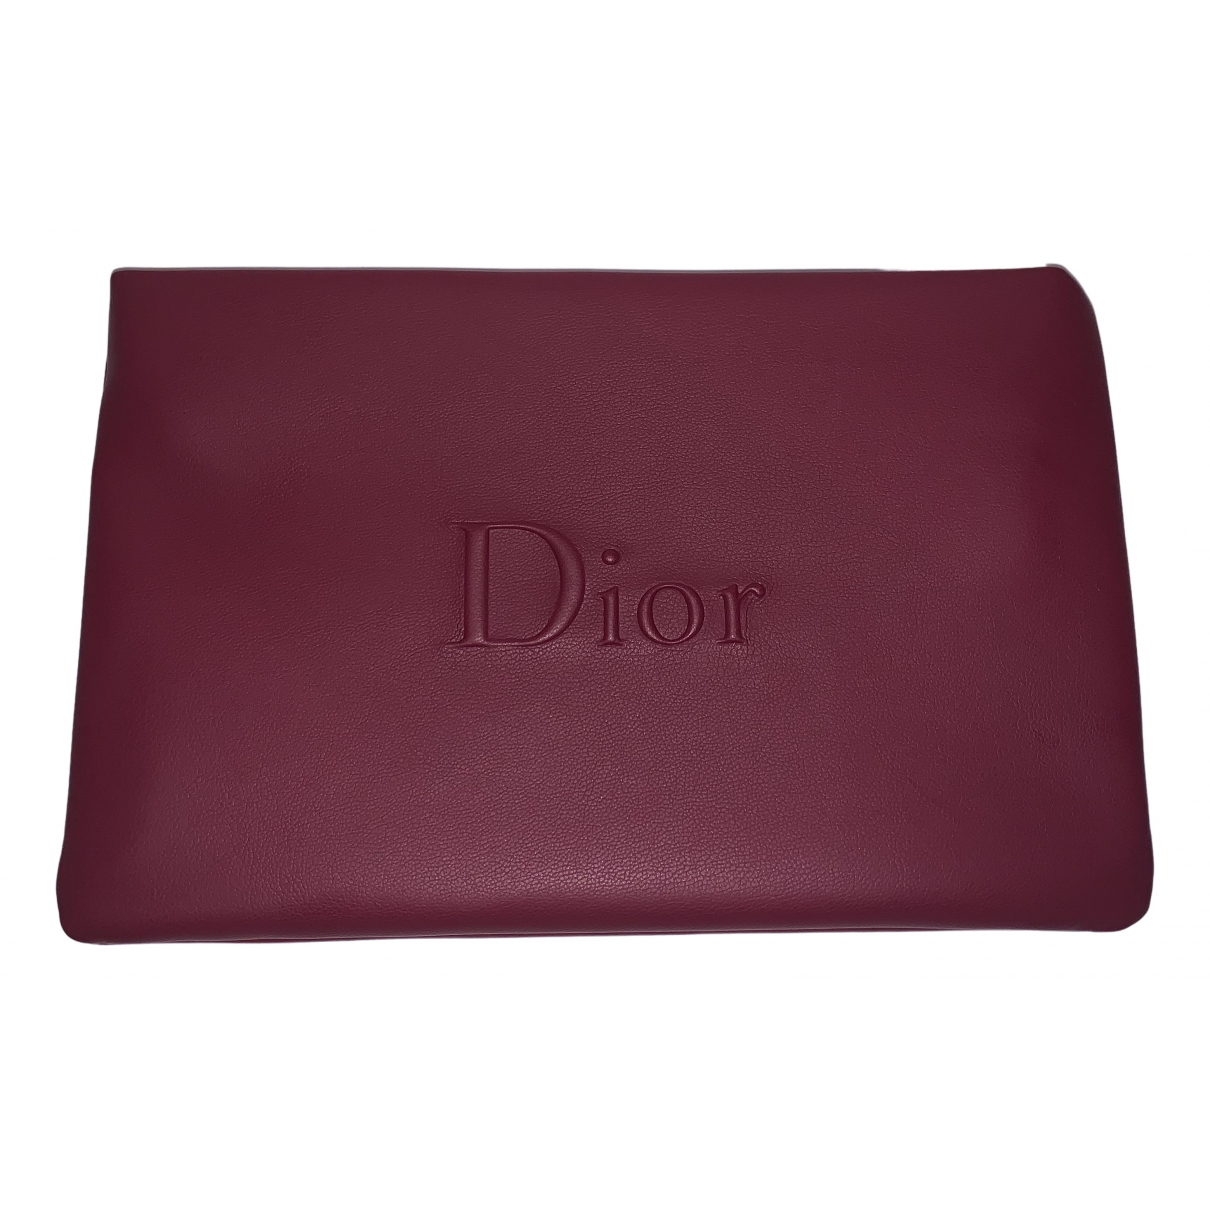 Dior \N Burgundy Travel bag for Women \N